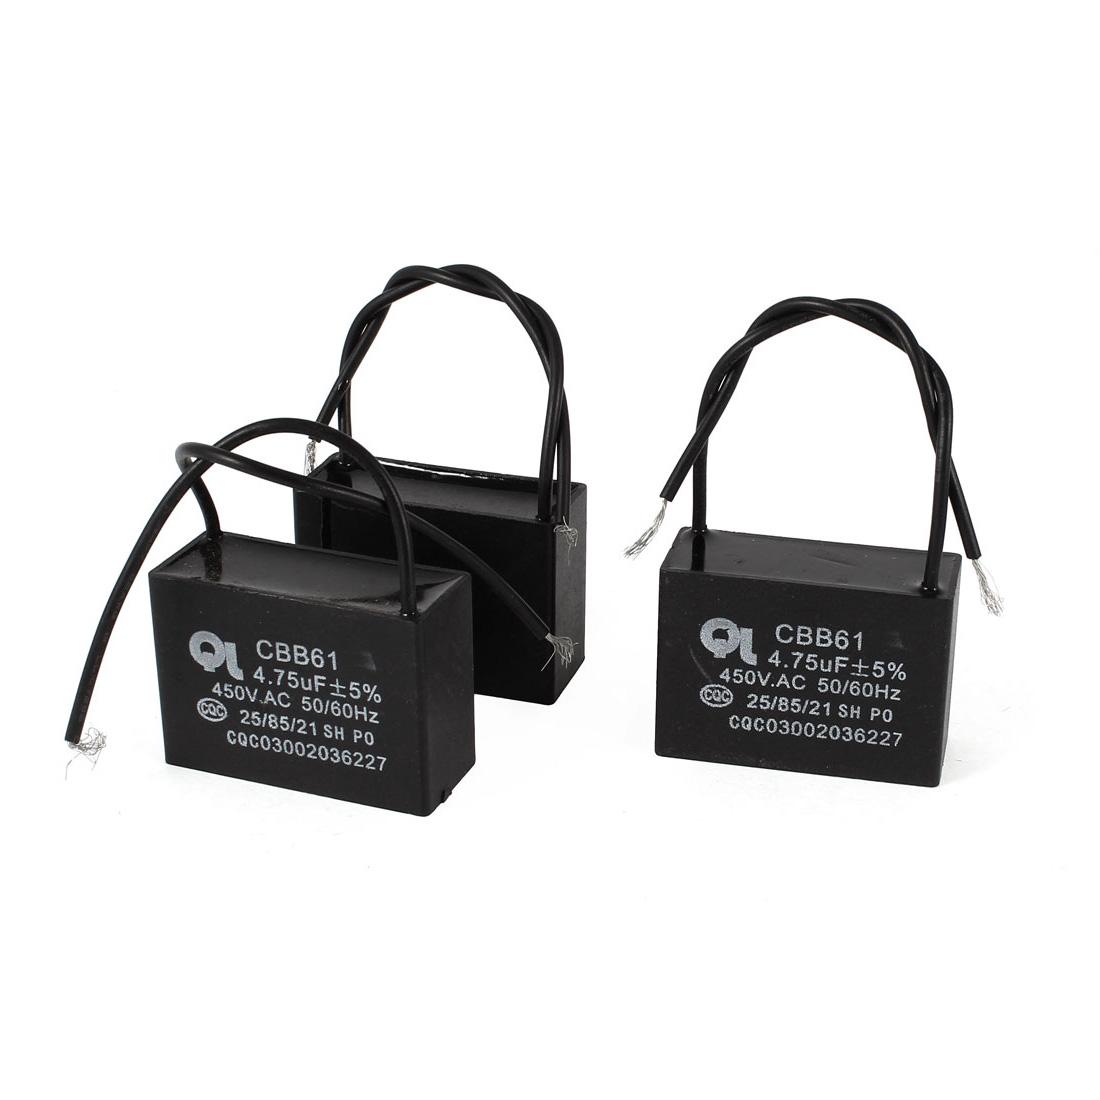 AC 450V 4.75uF 5% Dual Wired Metalized Polypropylene Film Motor Capacitors 3 Pcs